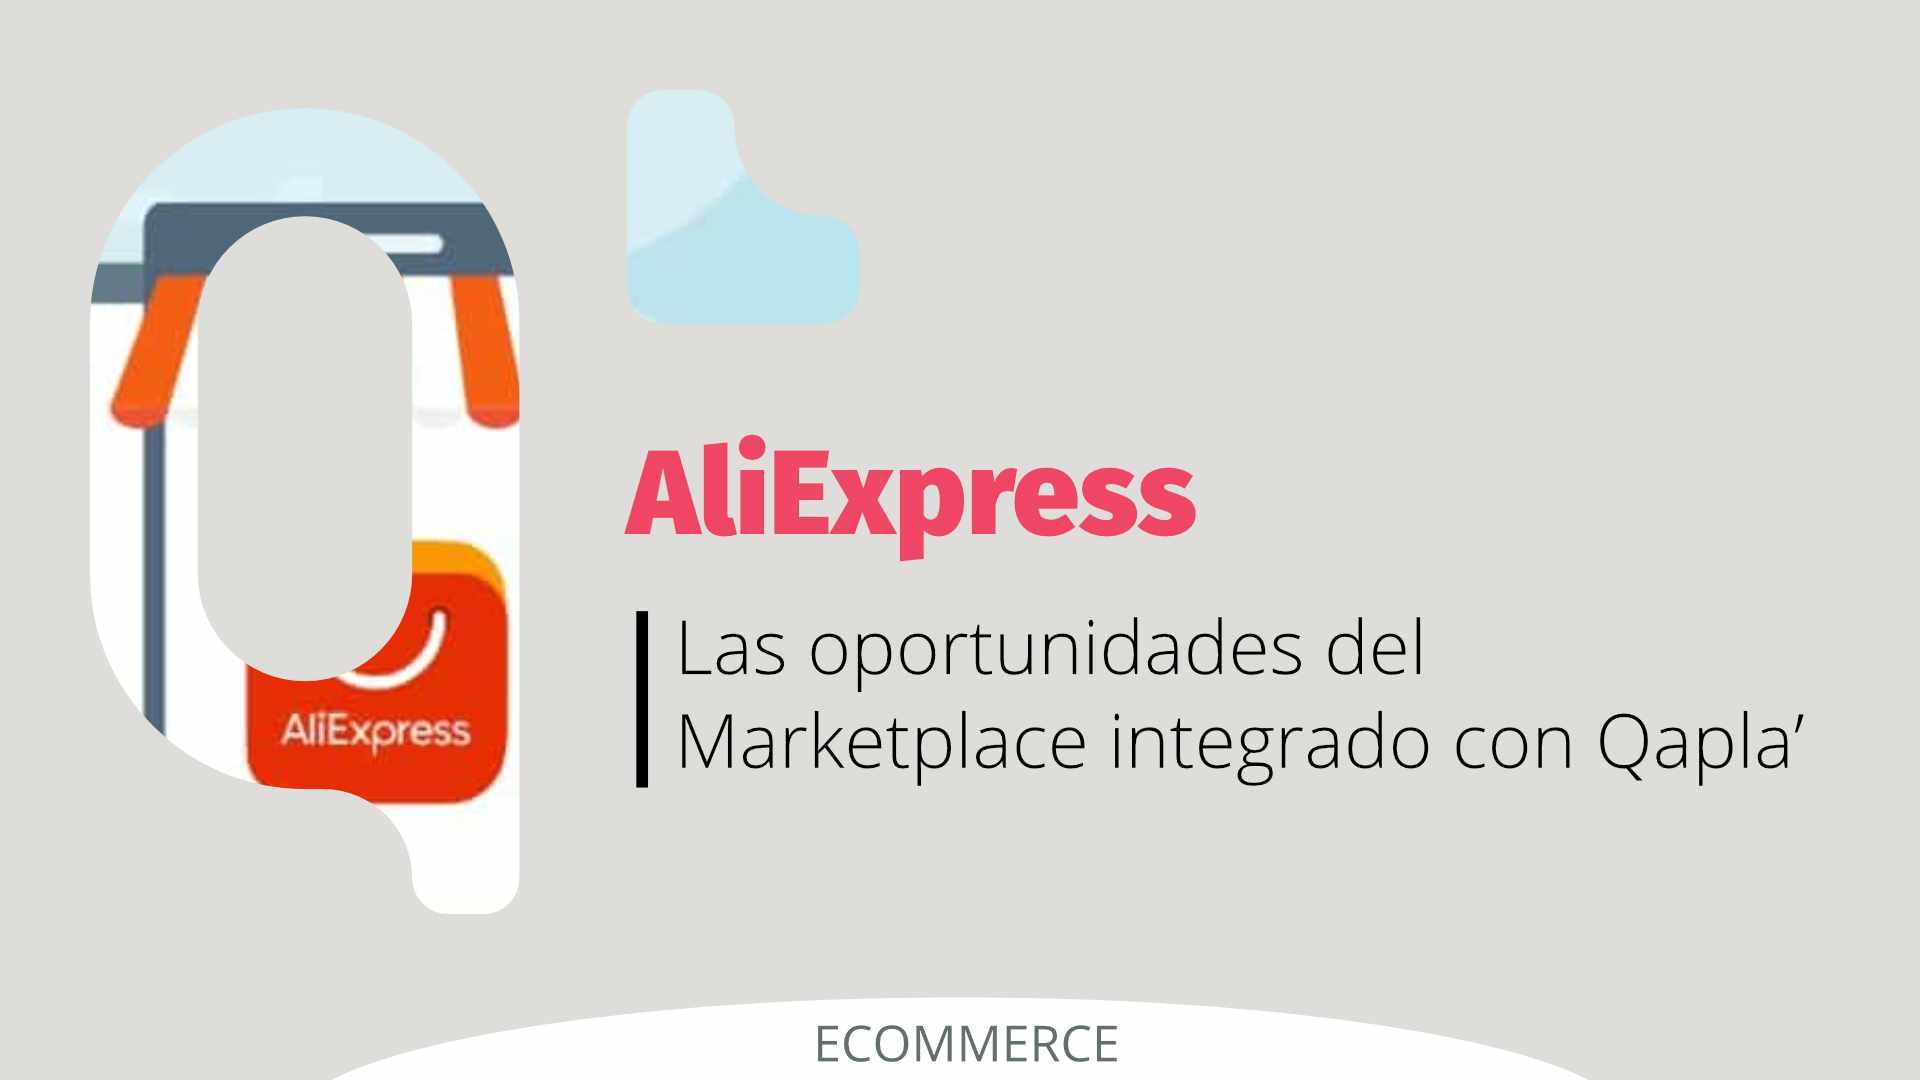 aliexpress ES